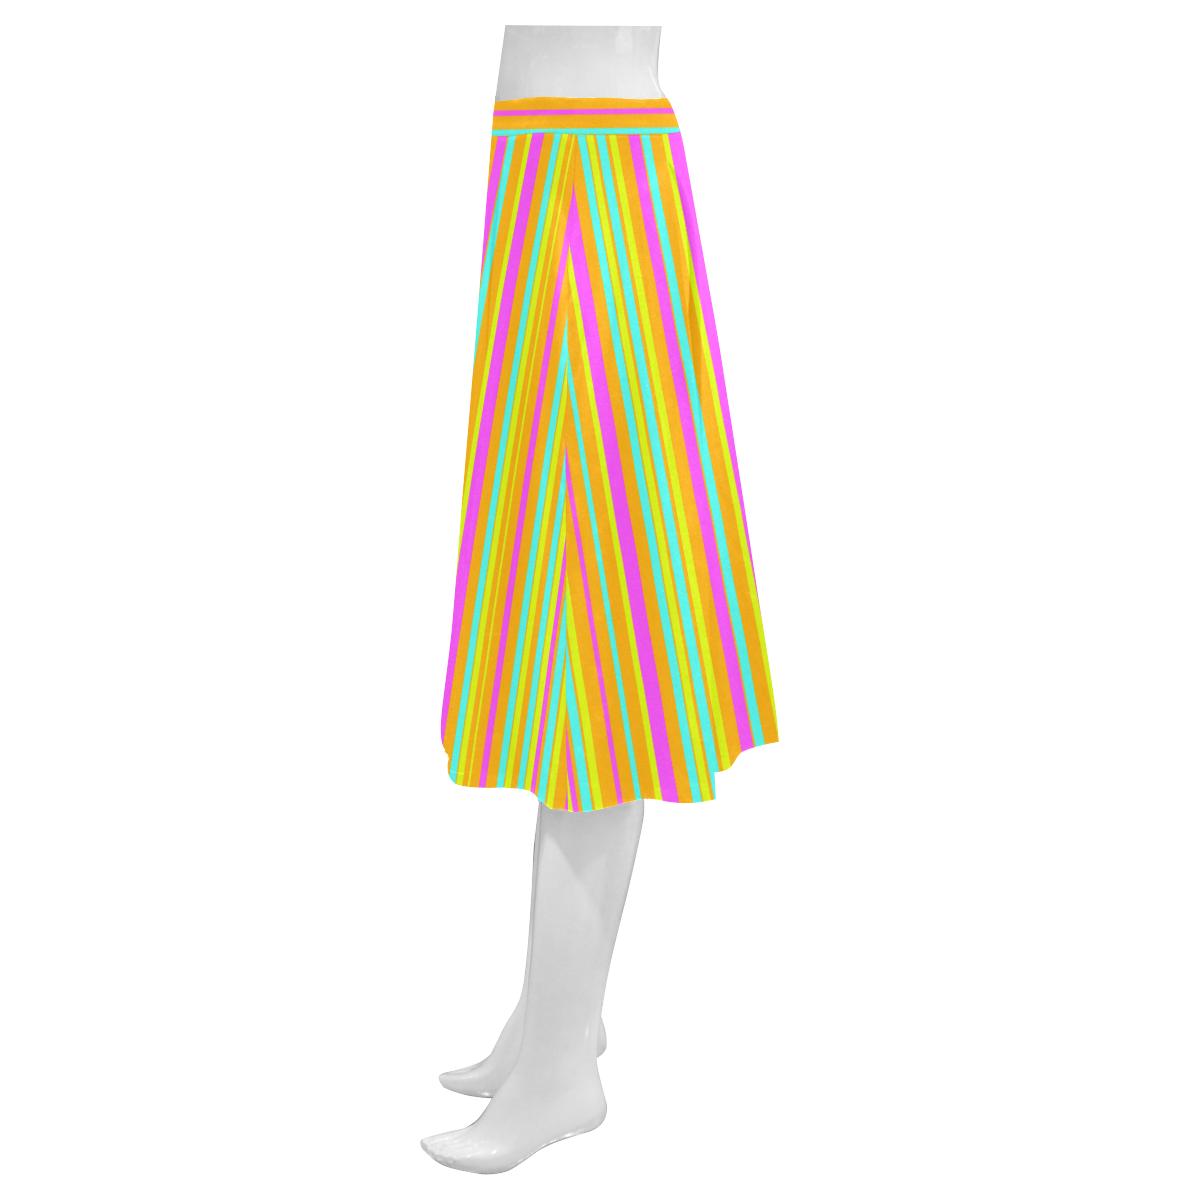 Neon Stripes  Tangerine Turquoise Yellow Pink Mnemosyne Women's Crepe Skirt (Model D16)